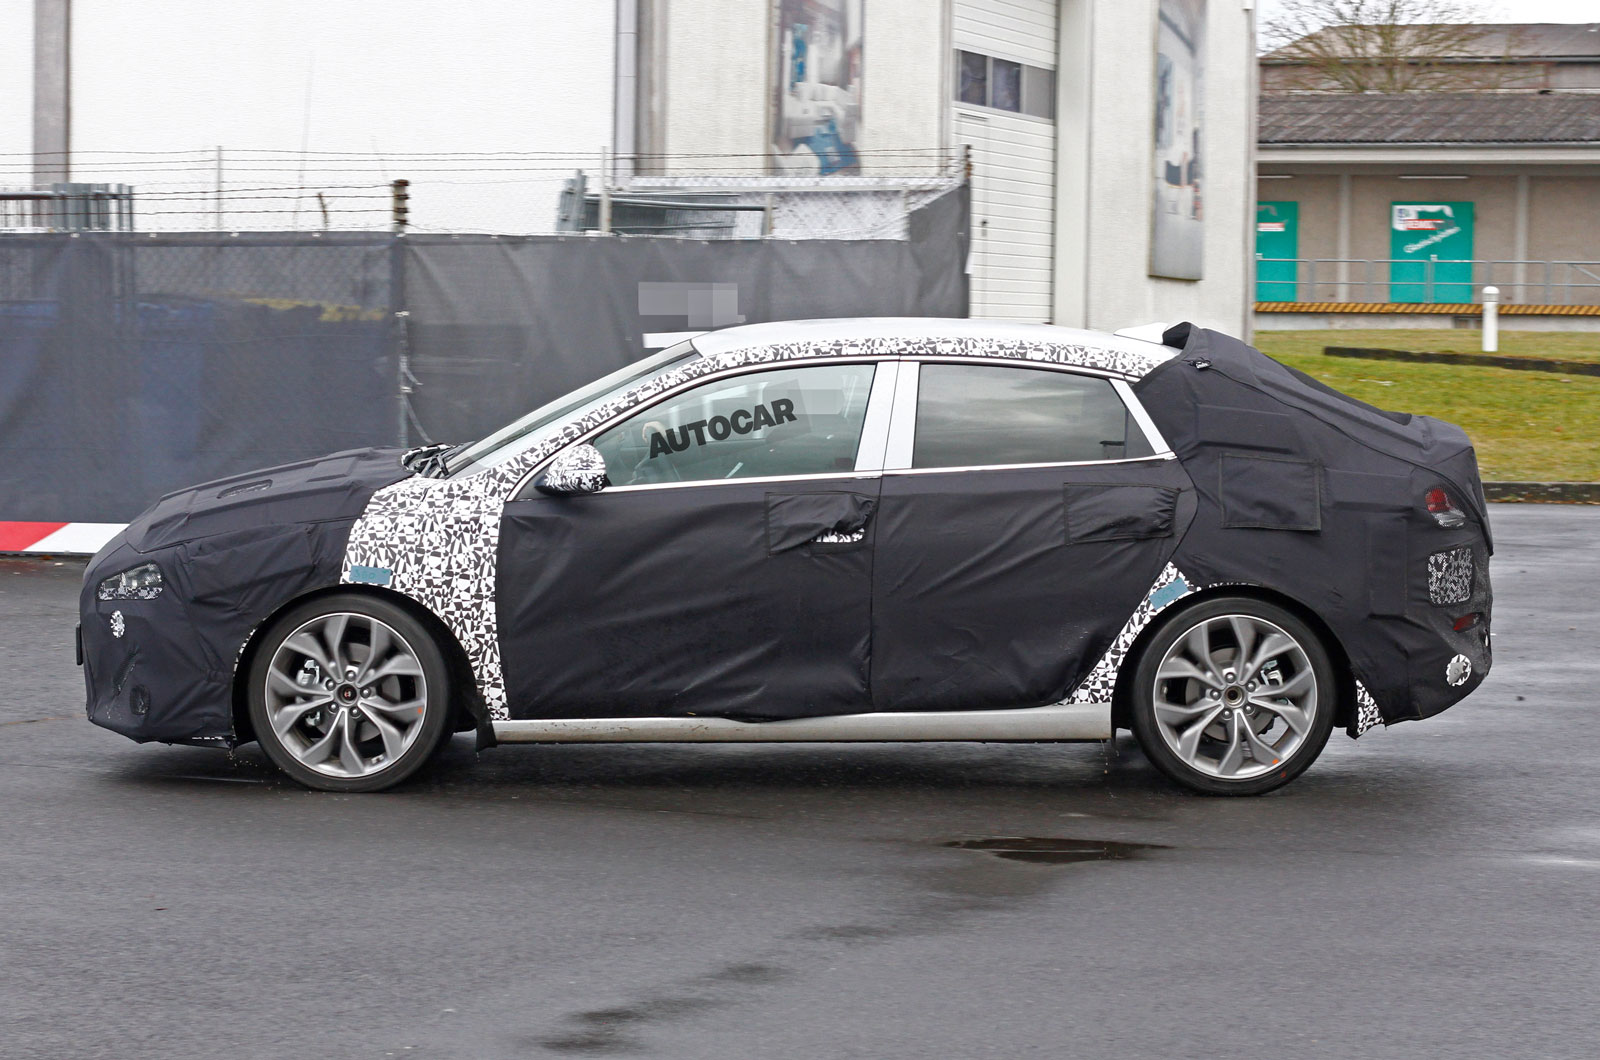 2018 Hyundai i30 Fastback to rival Mazda 3 Fastback   Autocar